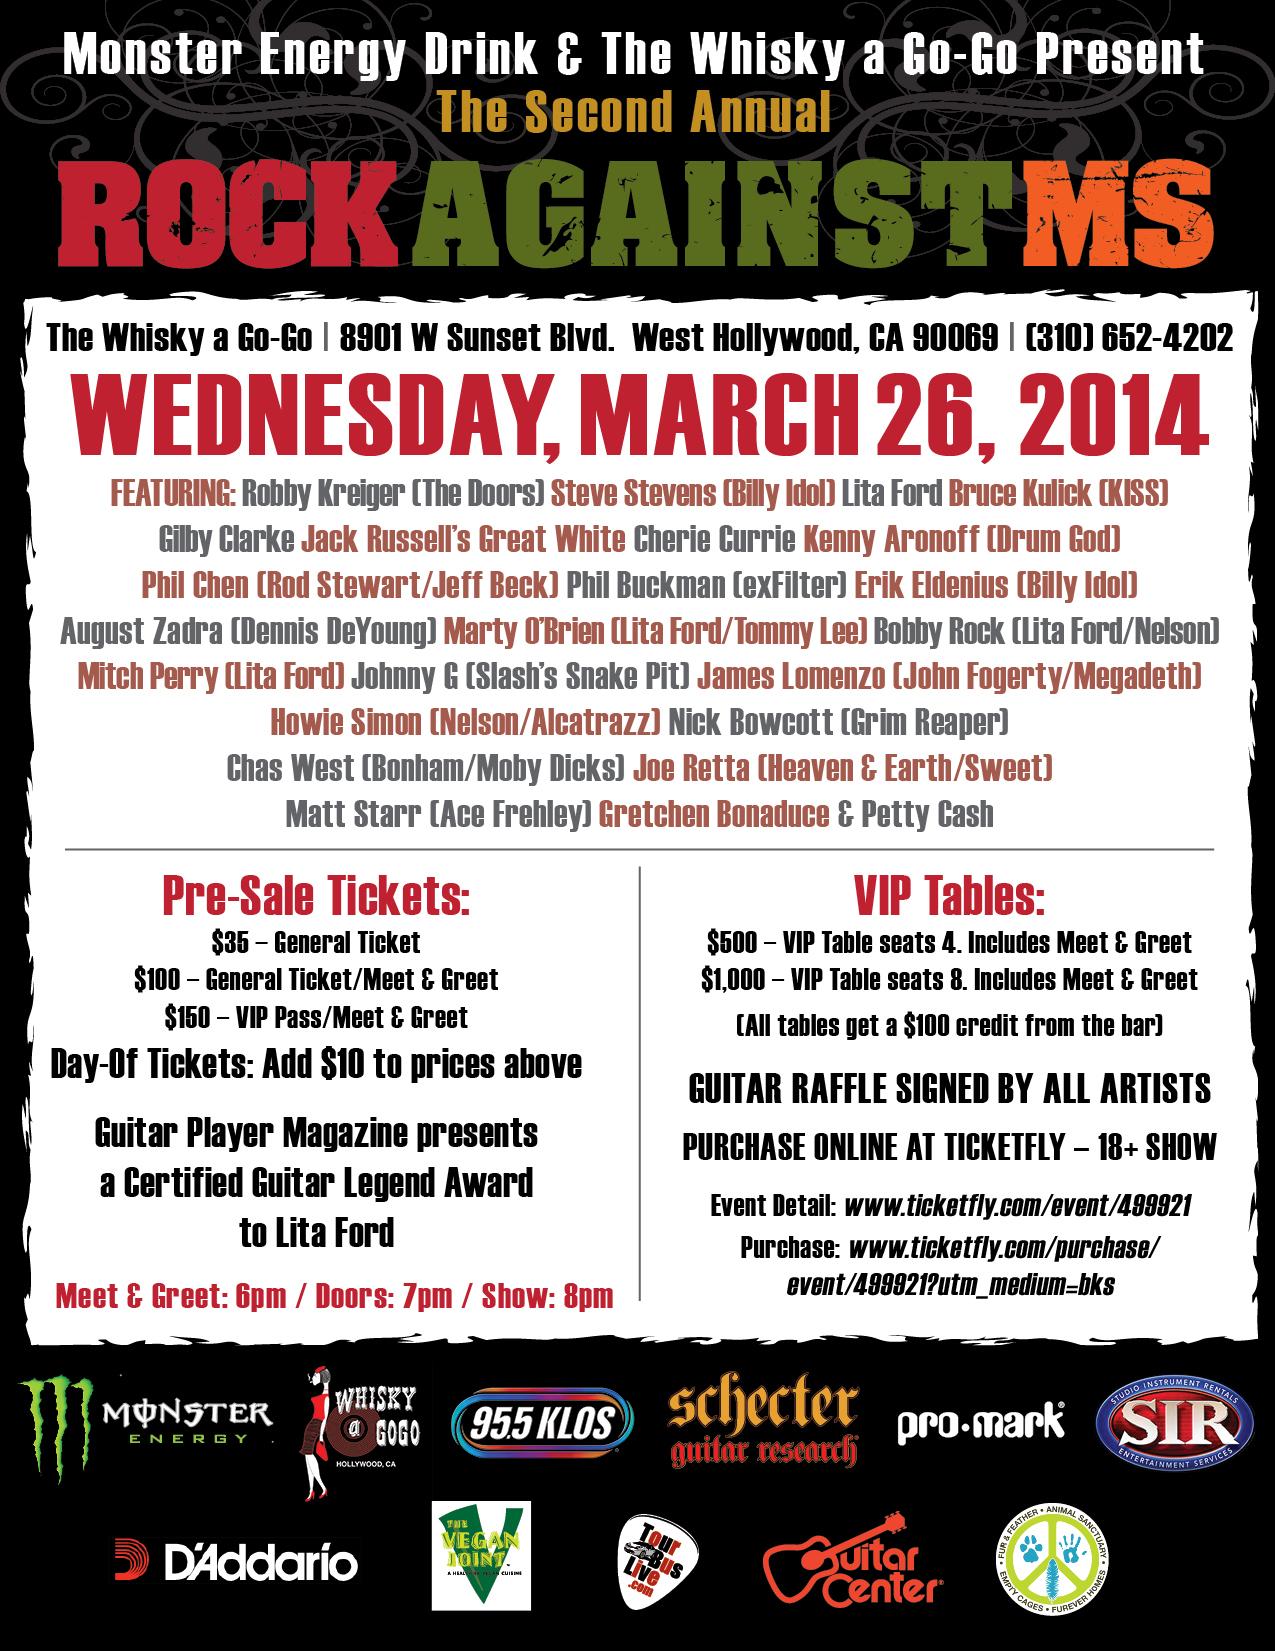 Rock Against MS & Ronald McDonald House Charities